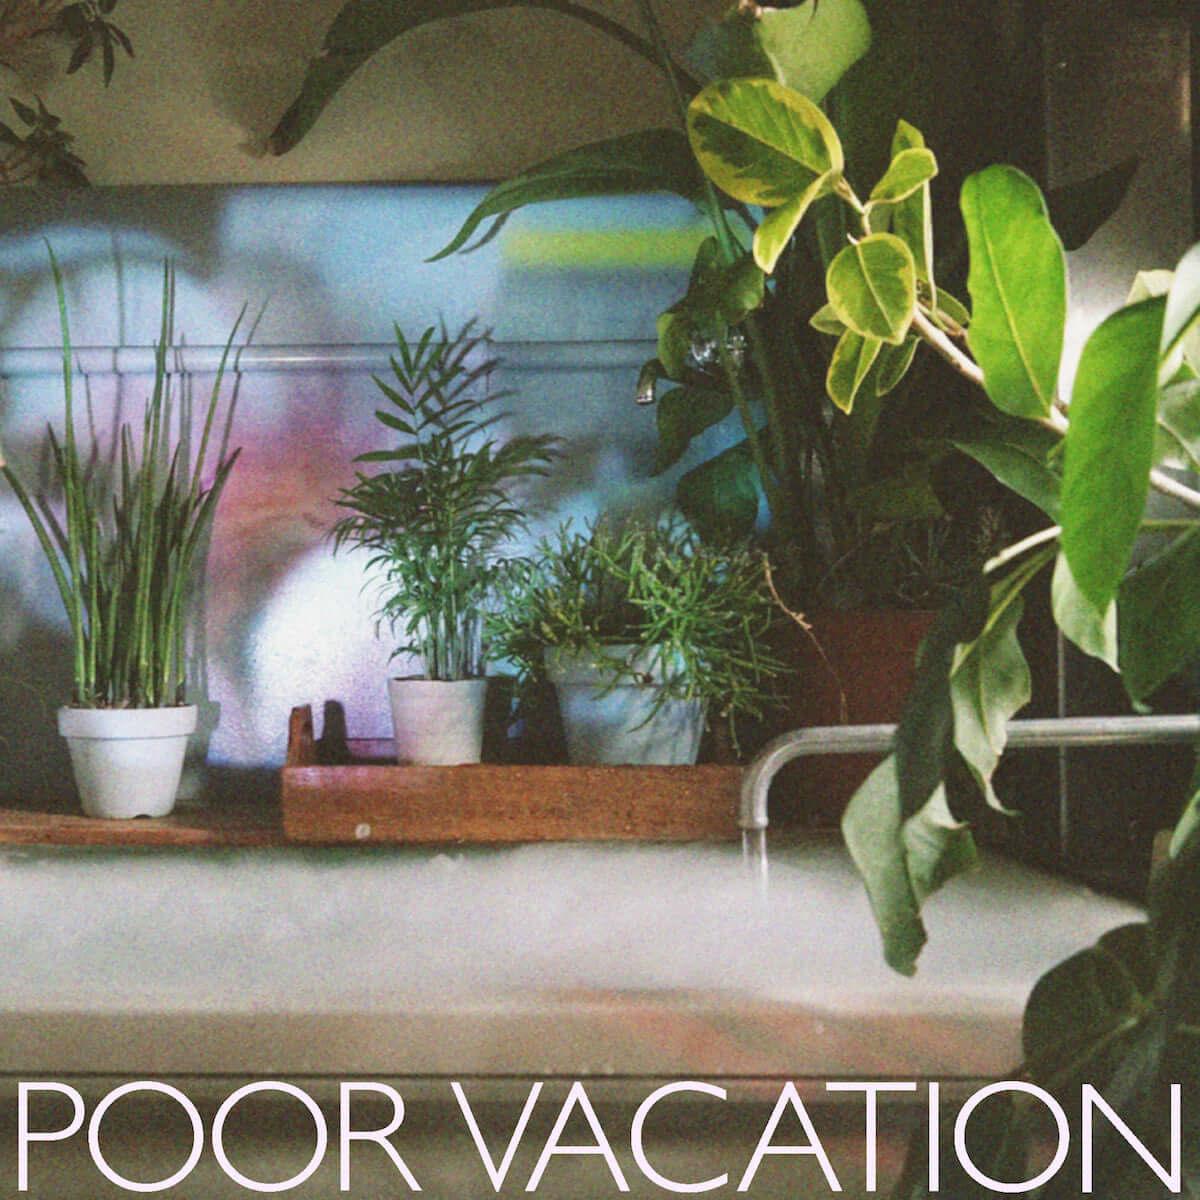 Poor Vacation、大比良瑞希、柳澤豊(MONO NO AWARE)らを迎えた特別編成での1stアルバムリリパ開催! 共演にOkada Takuro! music181011-poor-vacation-2-1200x1200